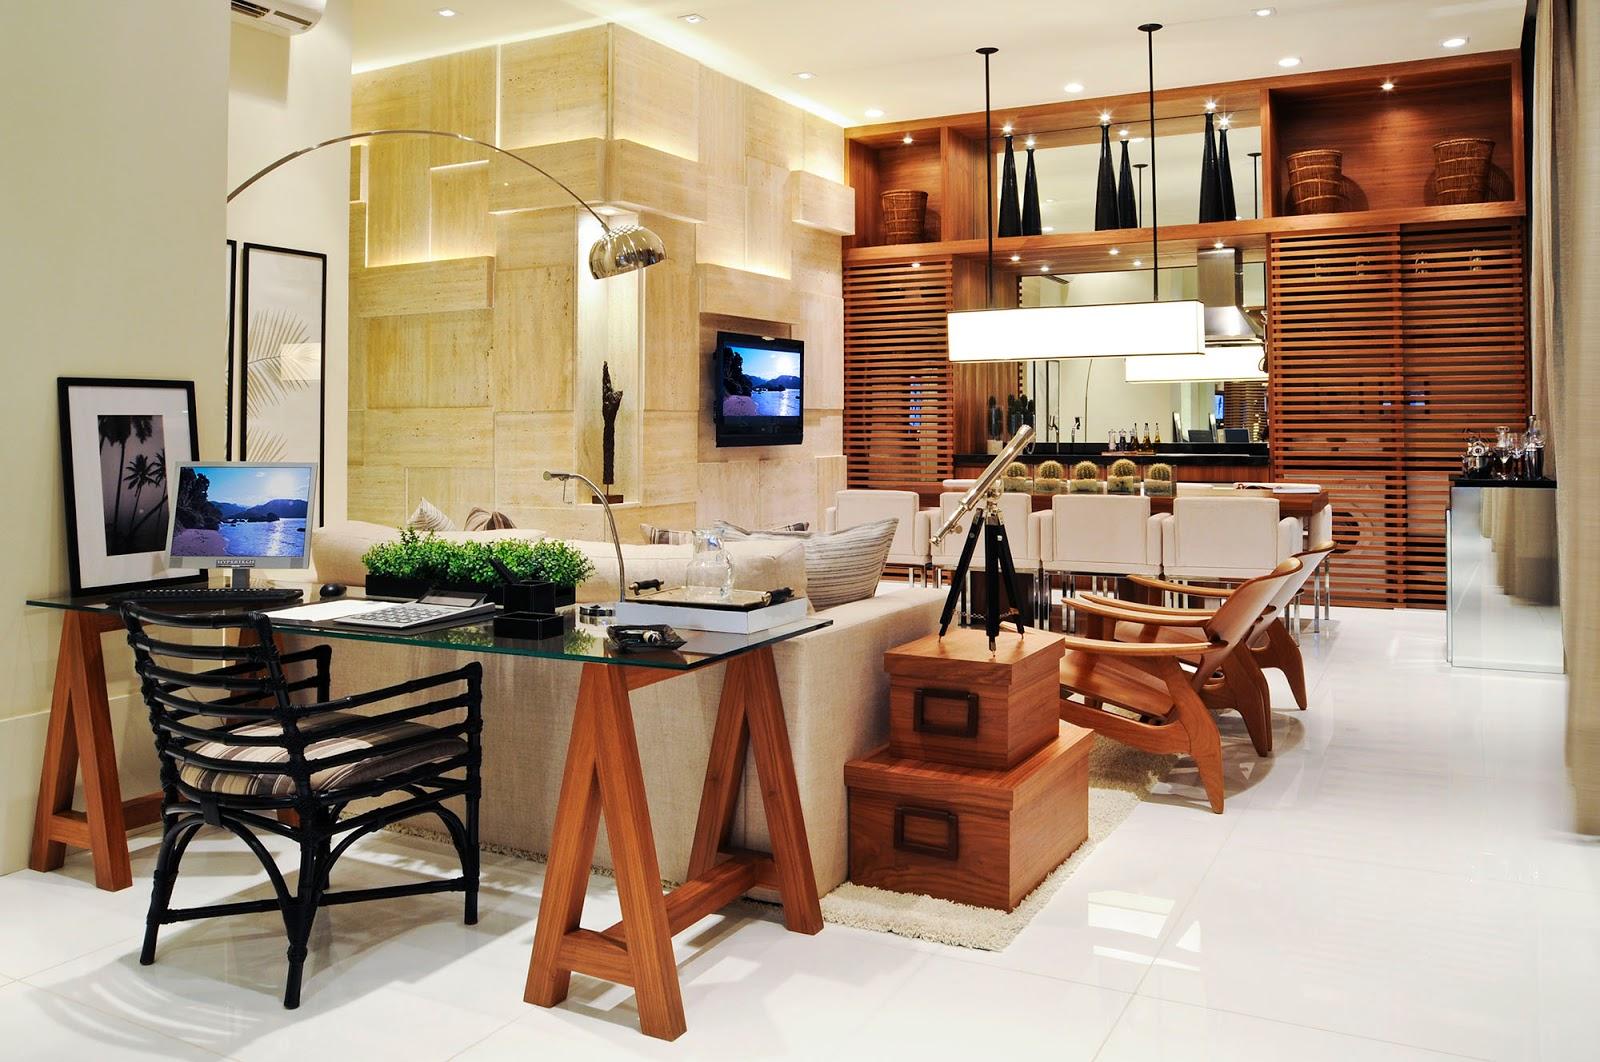 Mesa cavalete de madeira e tampo de vidro. Projeto: Debora Aguiar #A74C24 1600x1062